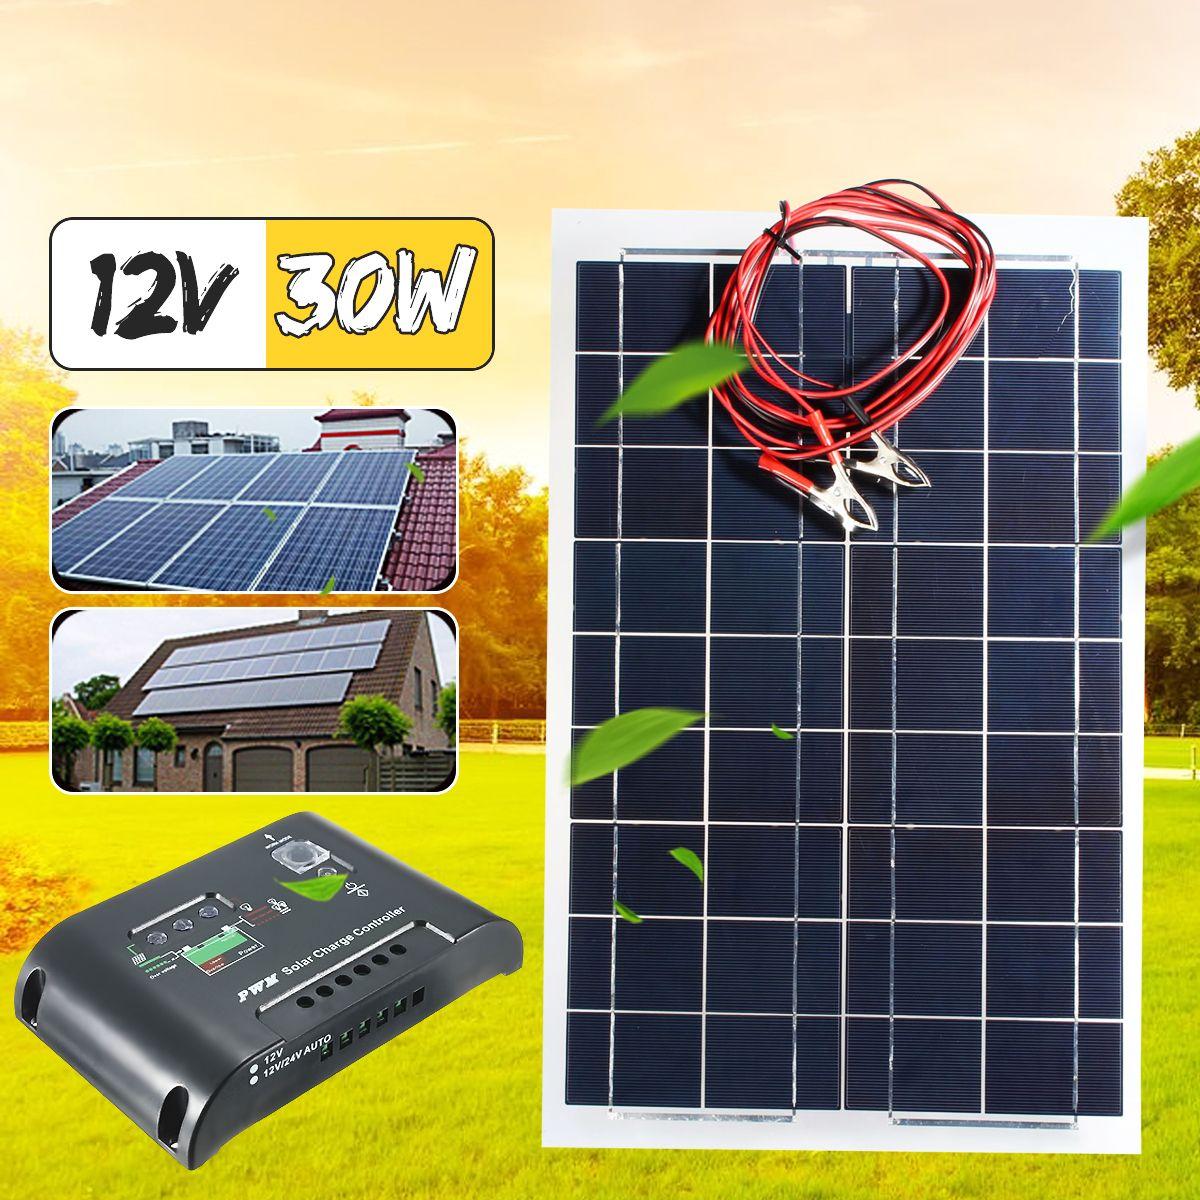 CLAITE 30W 18V Solar Panel Plate Flexible Solar Charger For Car Battery 12V Sunpower Polysilicon Cells +10A PWM Sun Controller